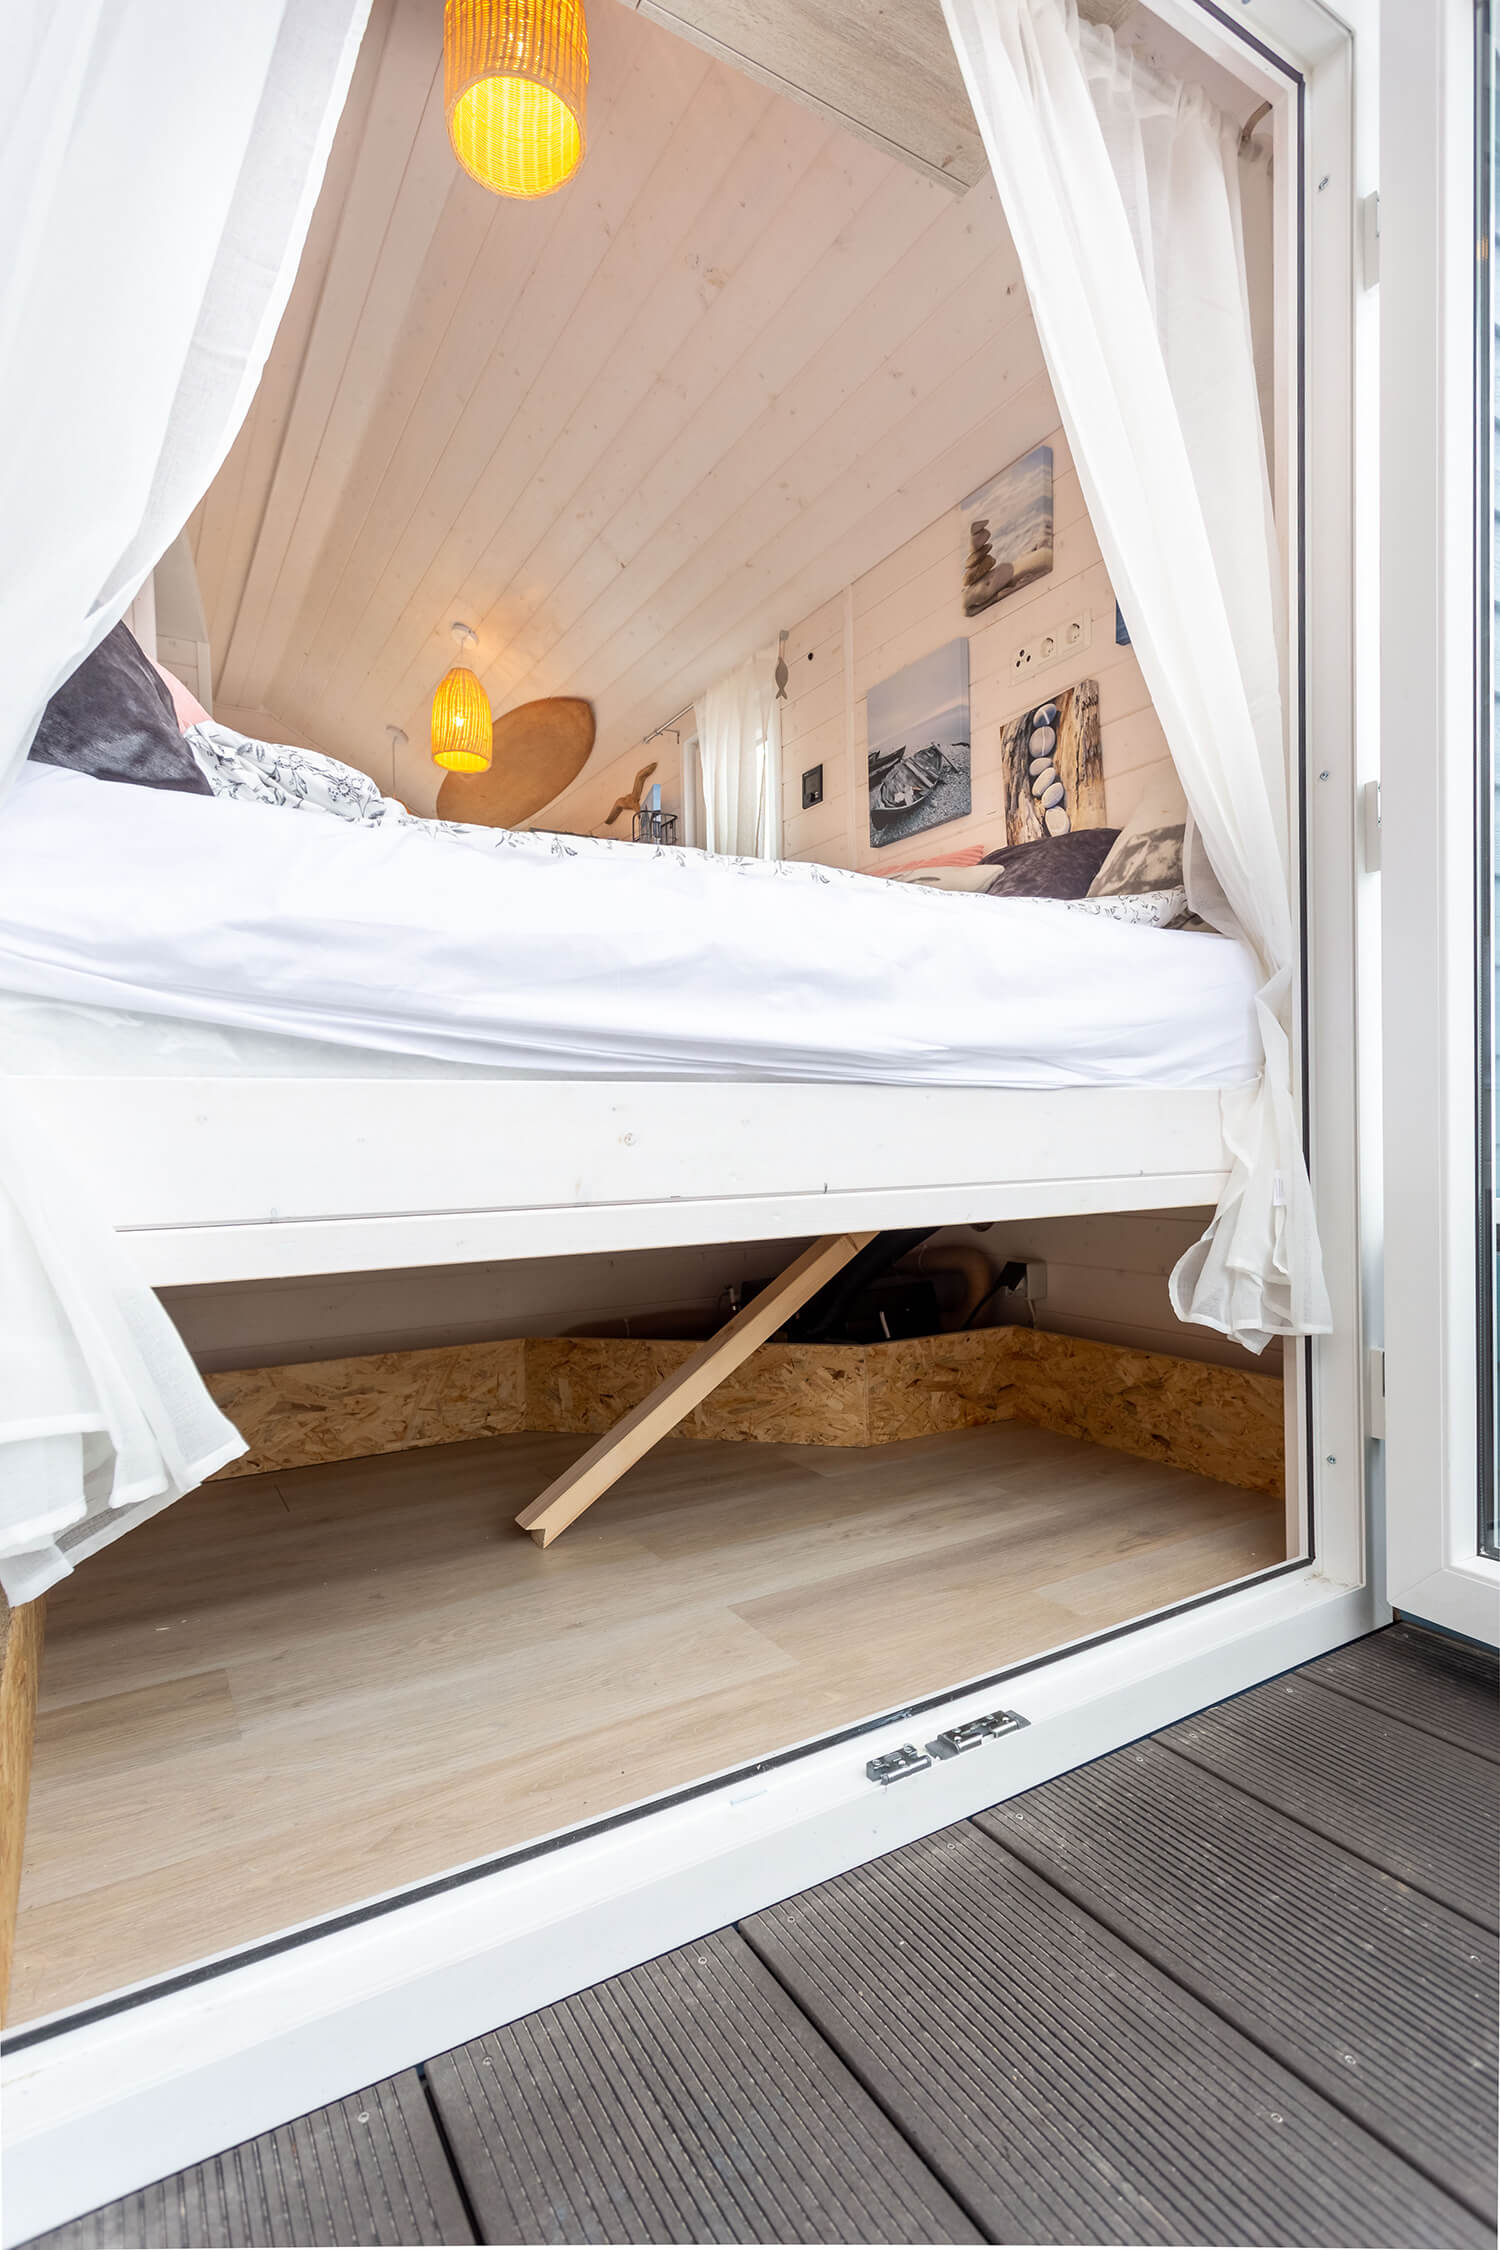 mobiles-tiny-house-kueste-vital-camp-gmbh38